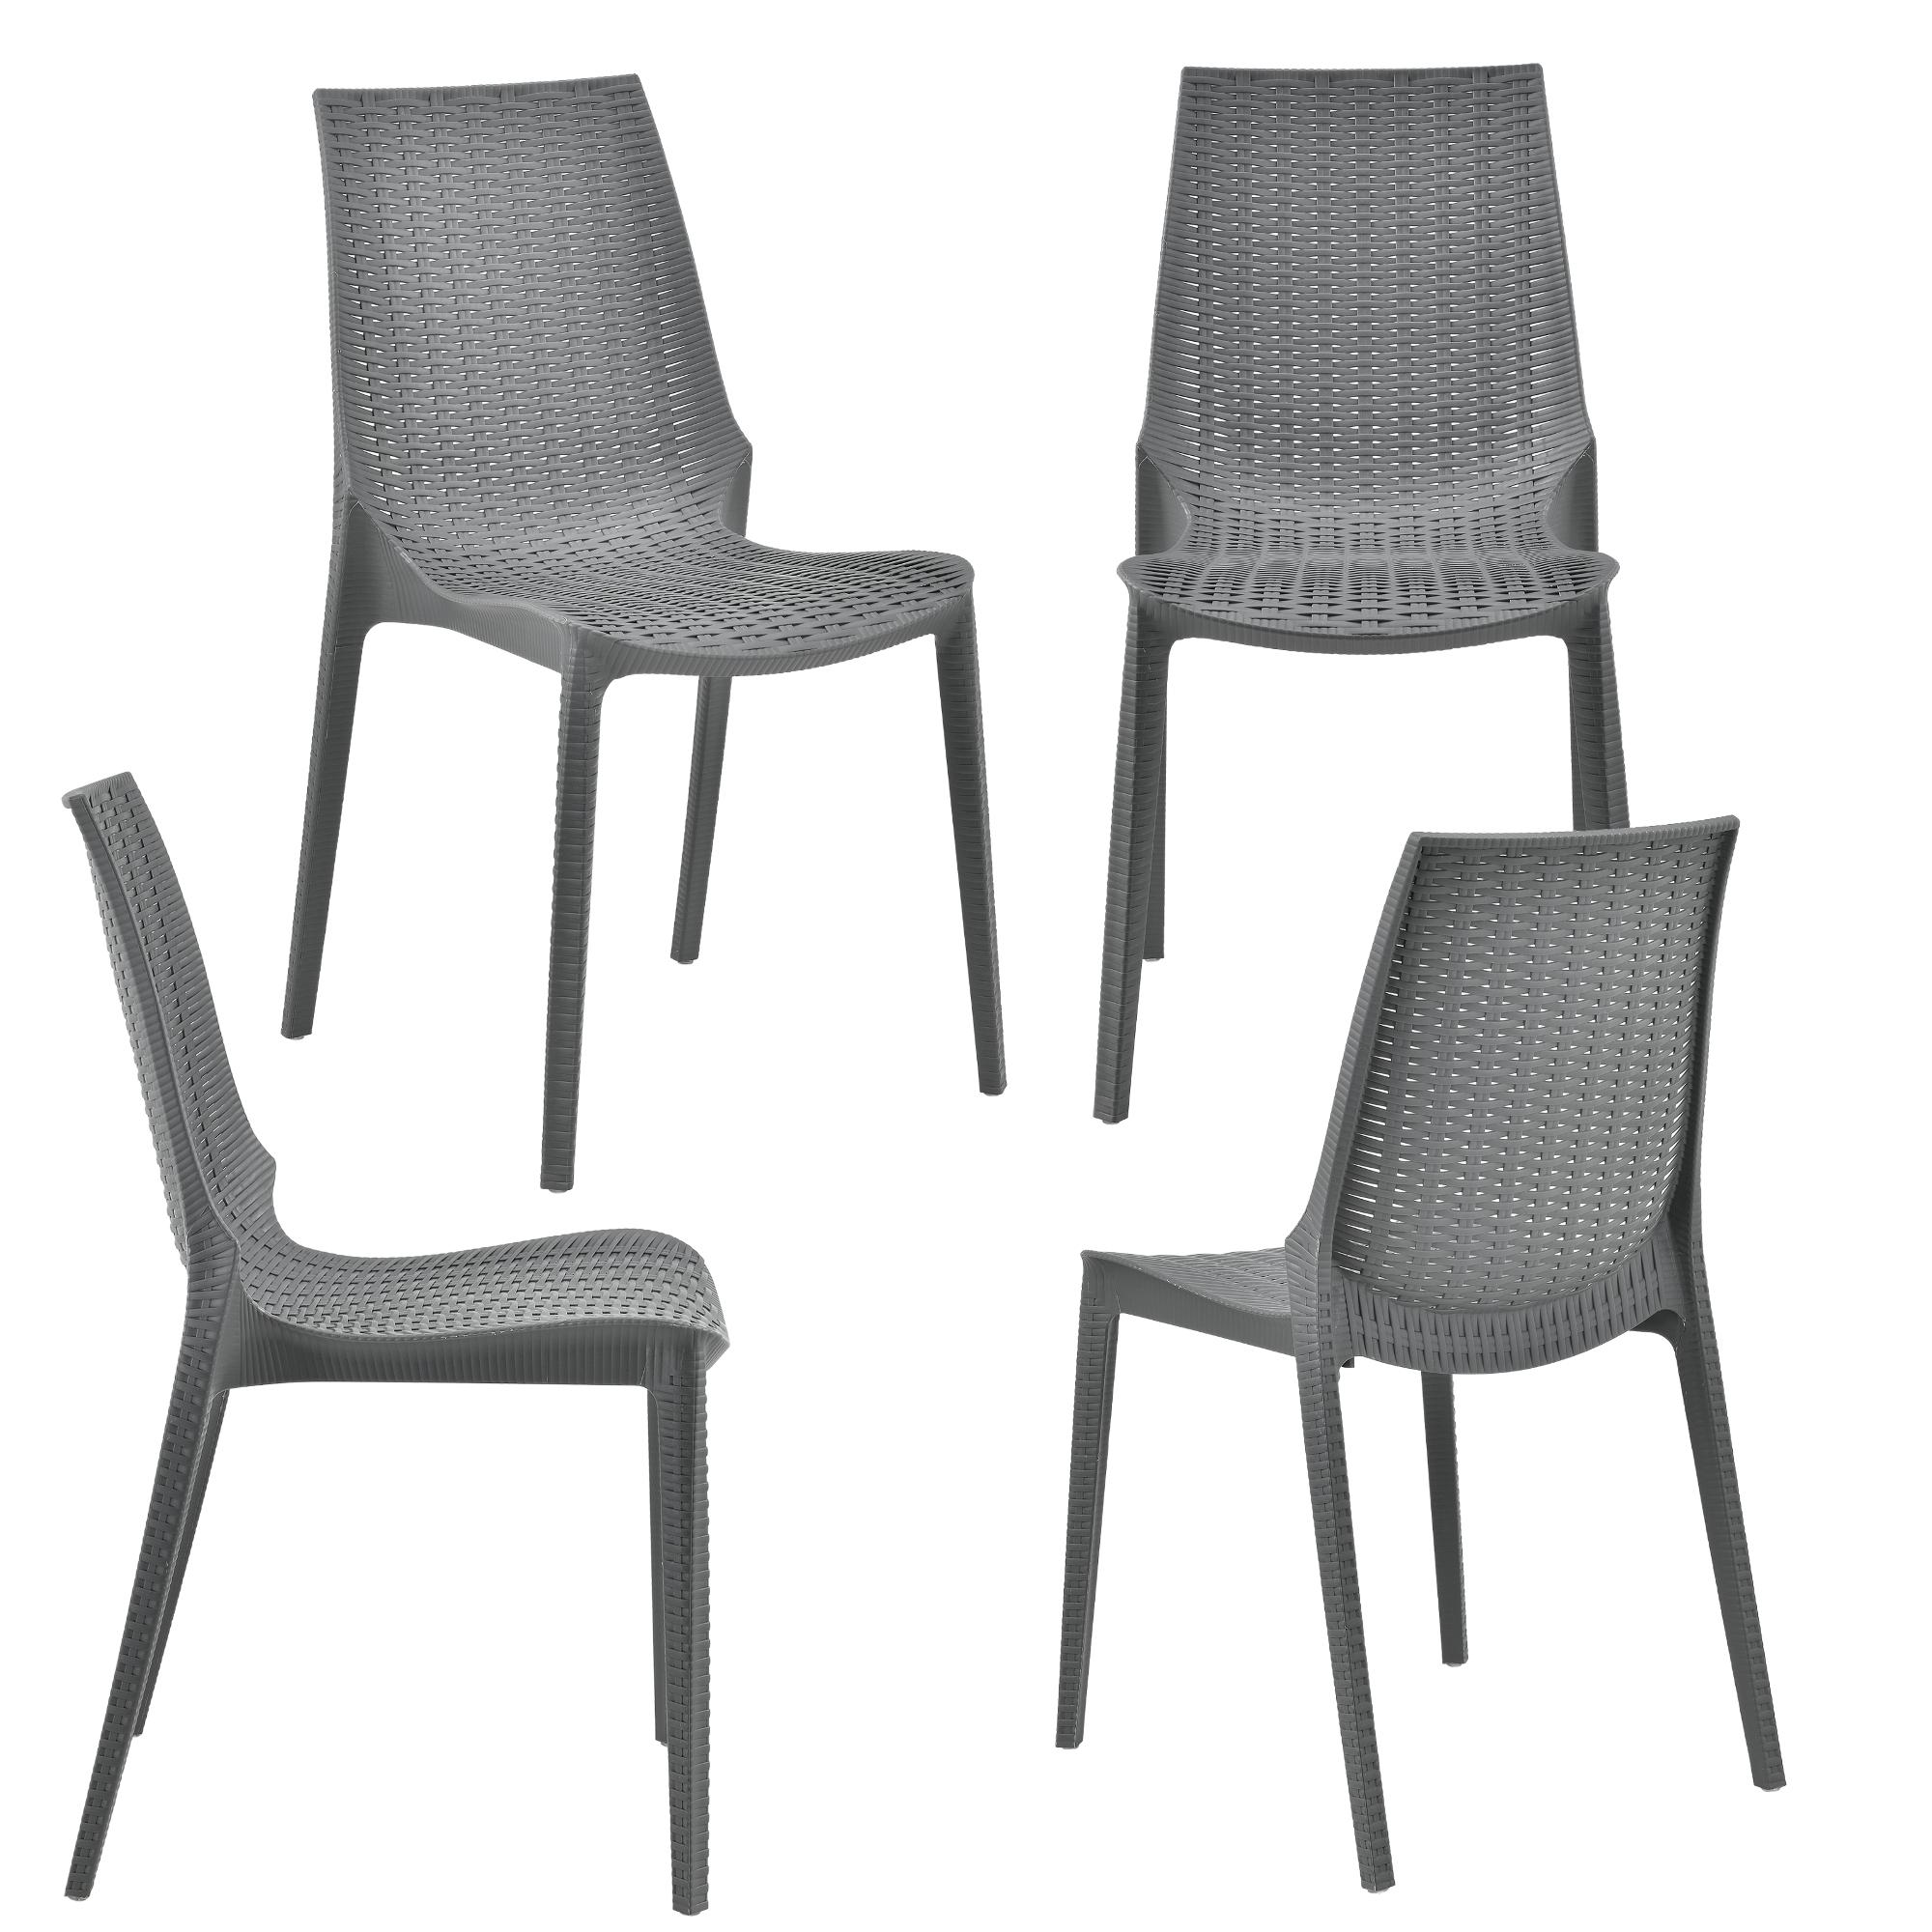 seating area garden furniture grey poly rattan. Black Bedroom Furniture Sets. Home Design Ideas